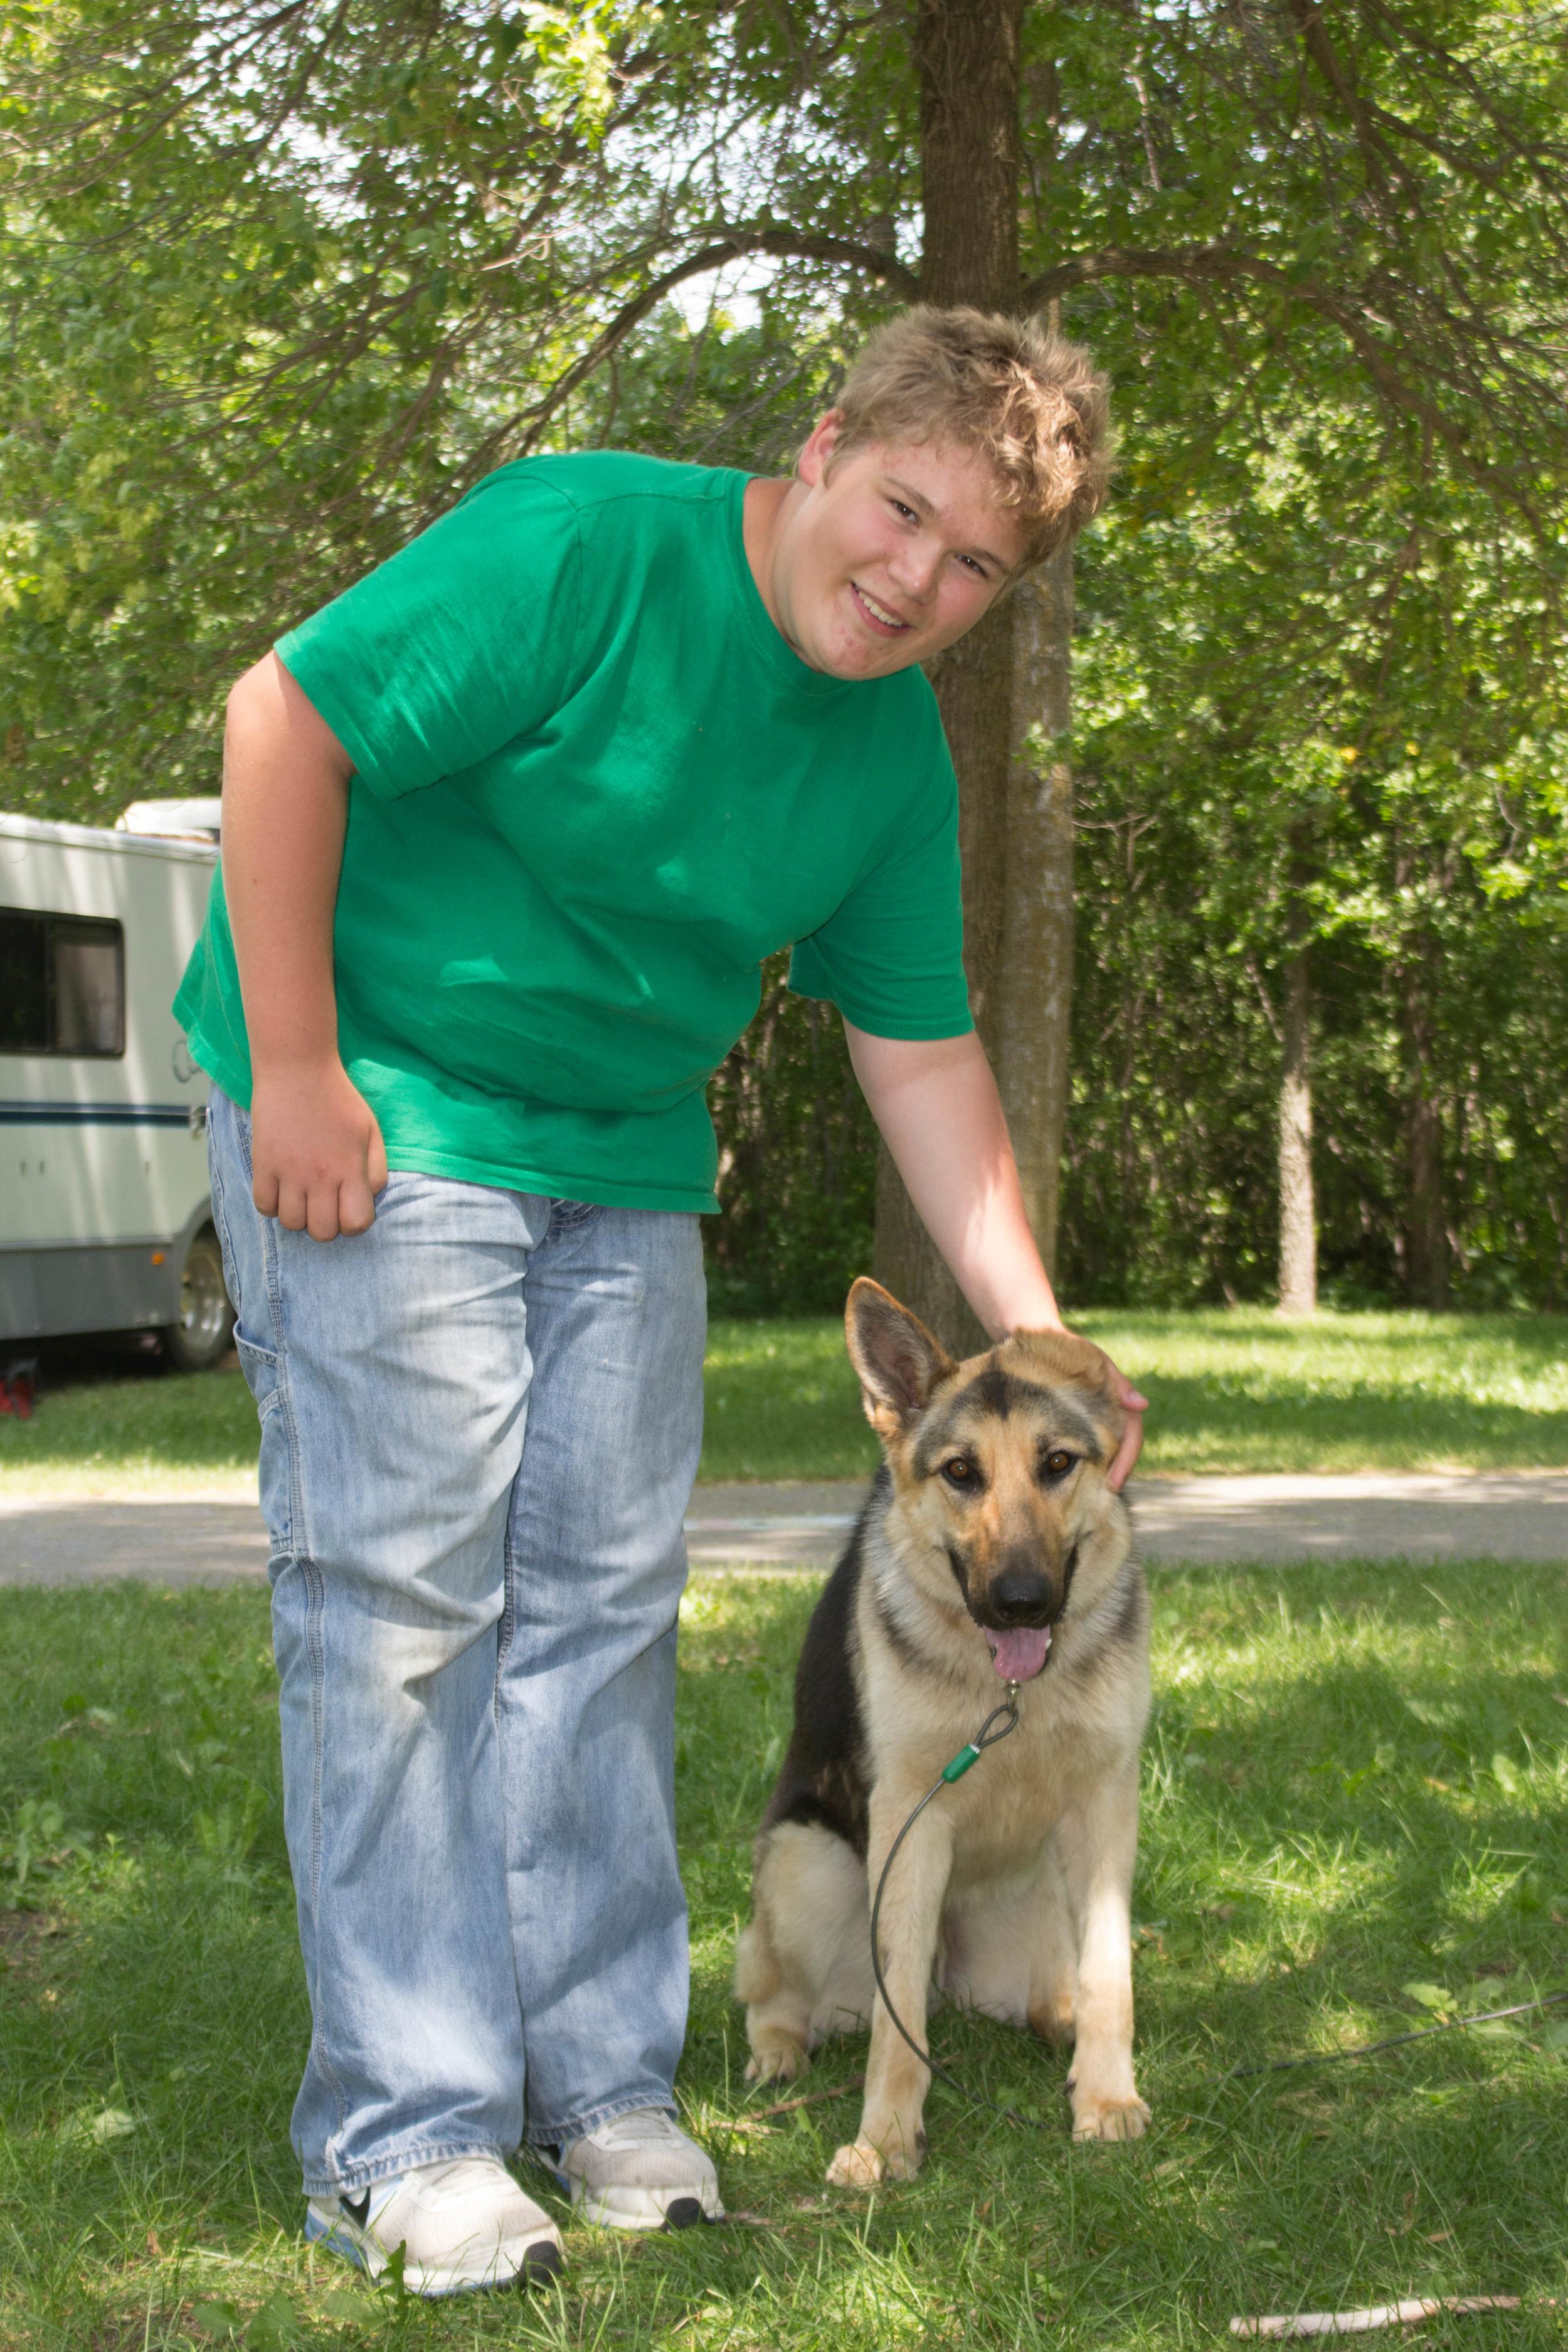 Max the Wonder Dog keeping an eye on Jacob